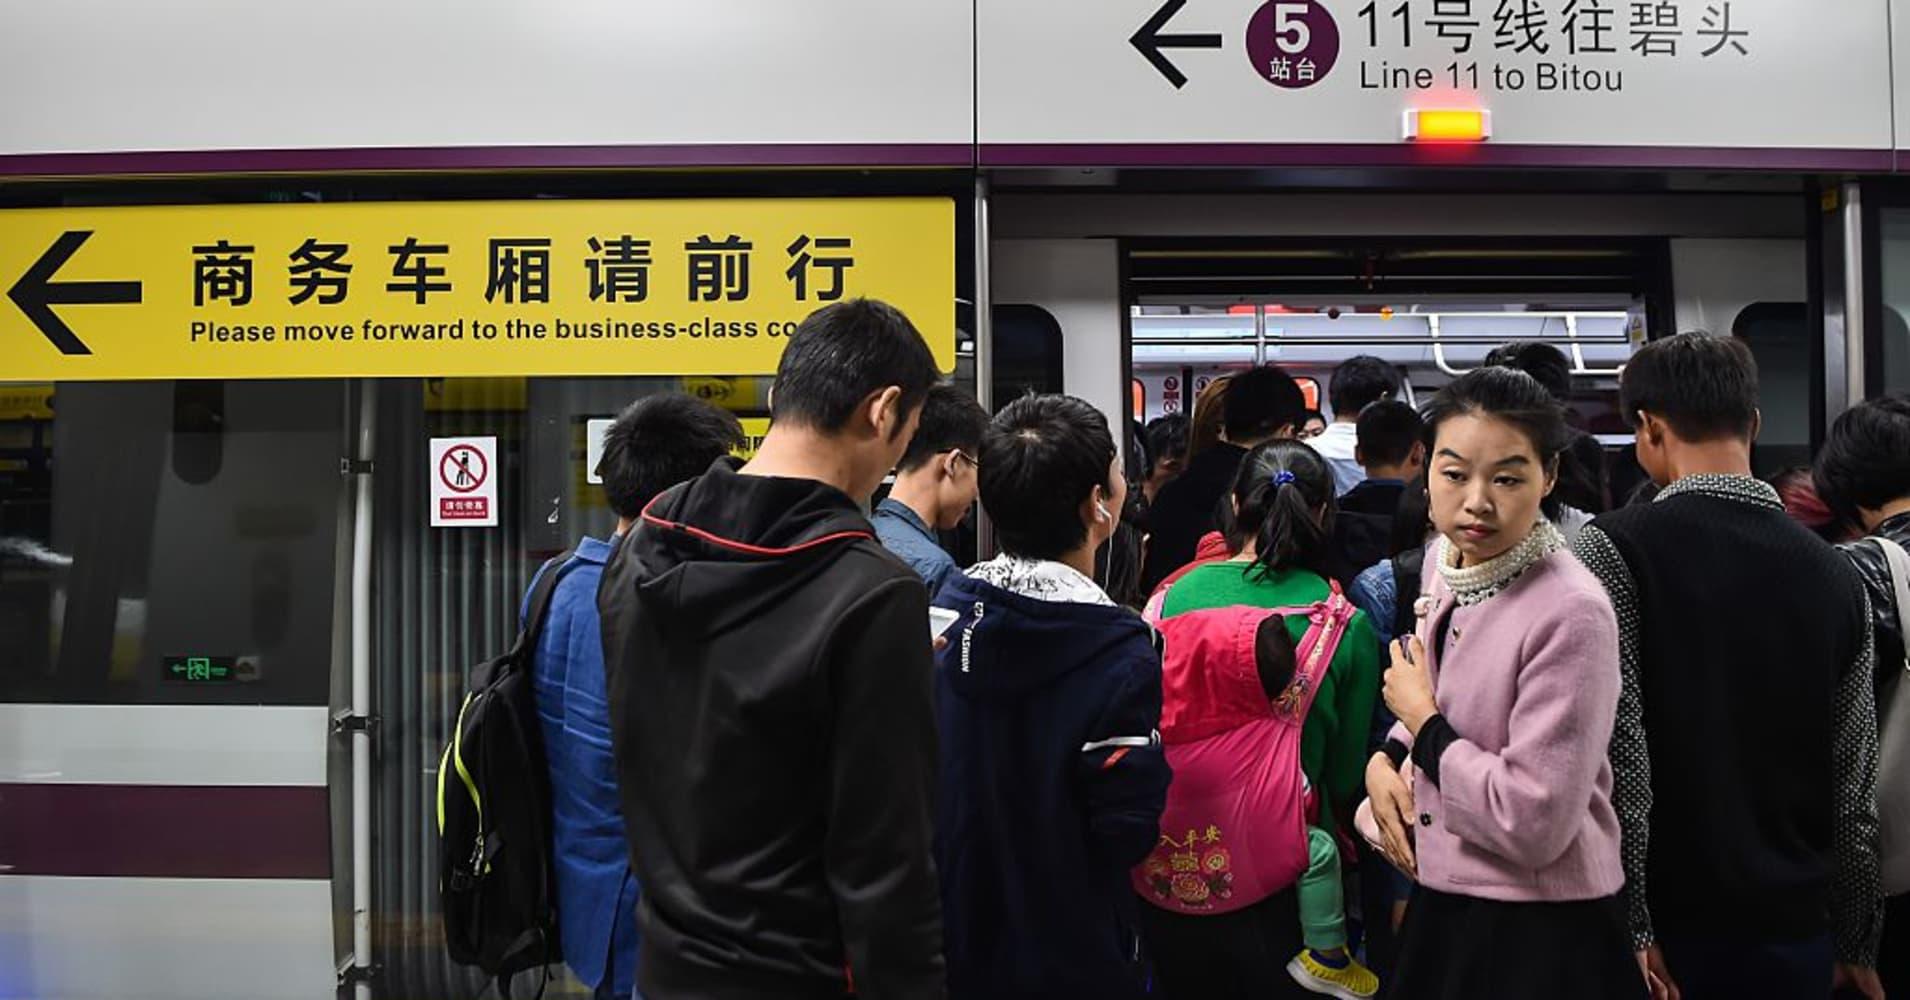 China needs to push ahead with urbanization, says award-winning writer of a dystopian Beijing